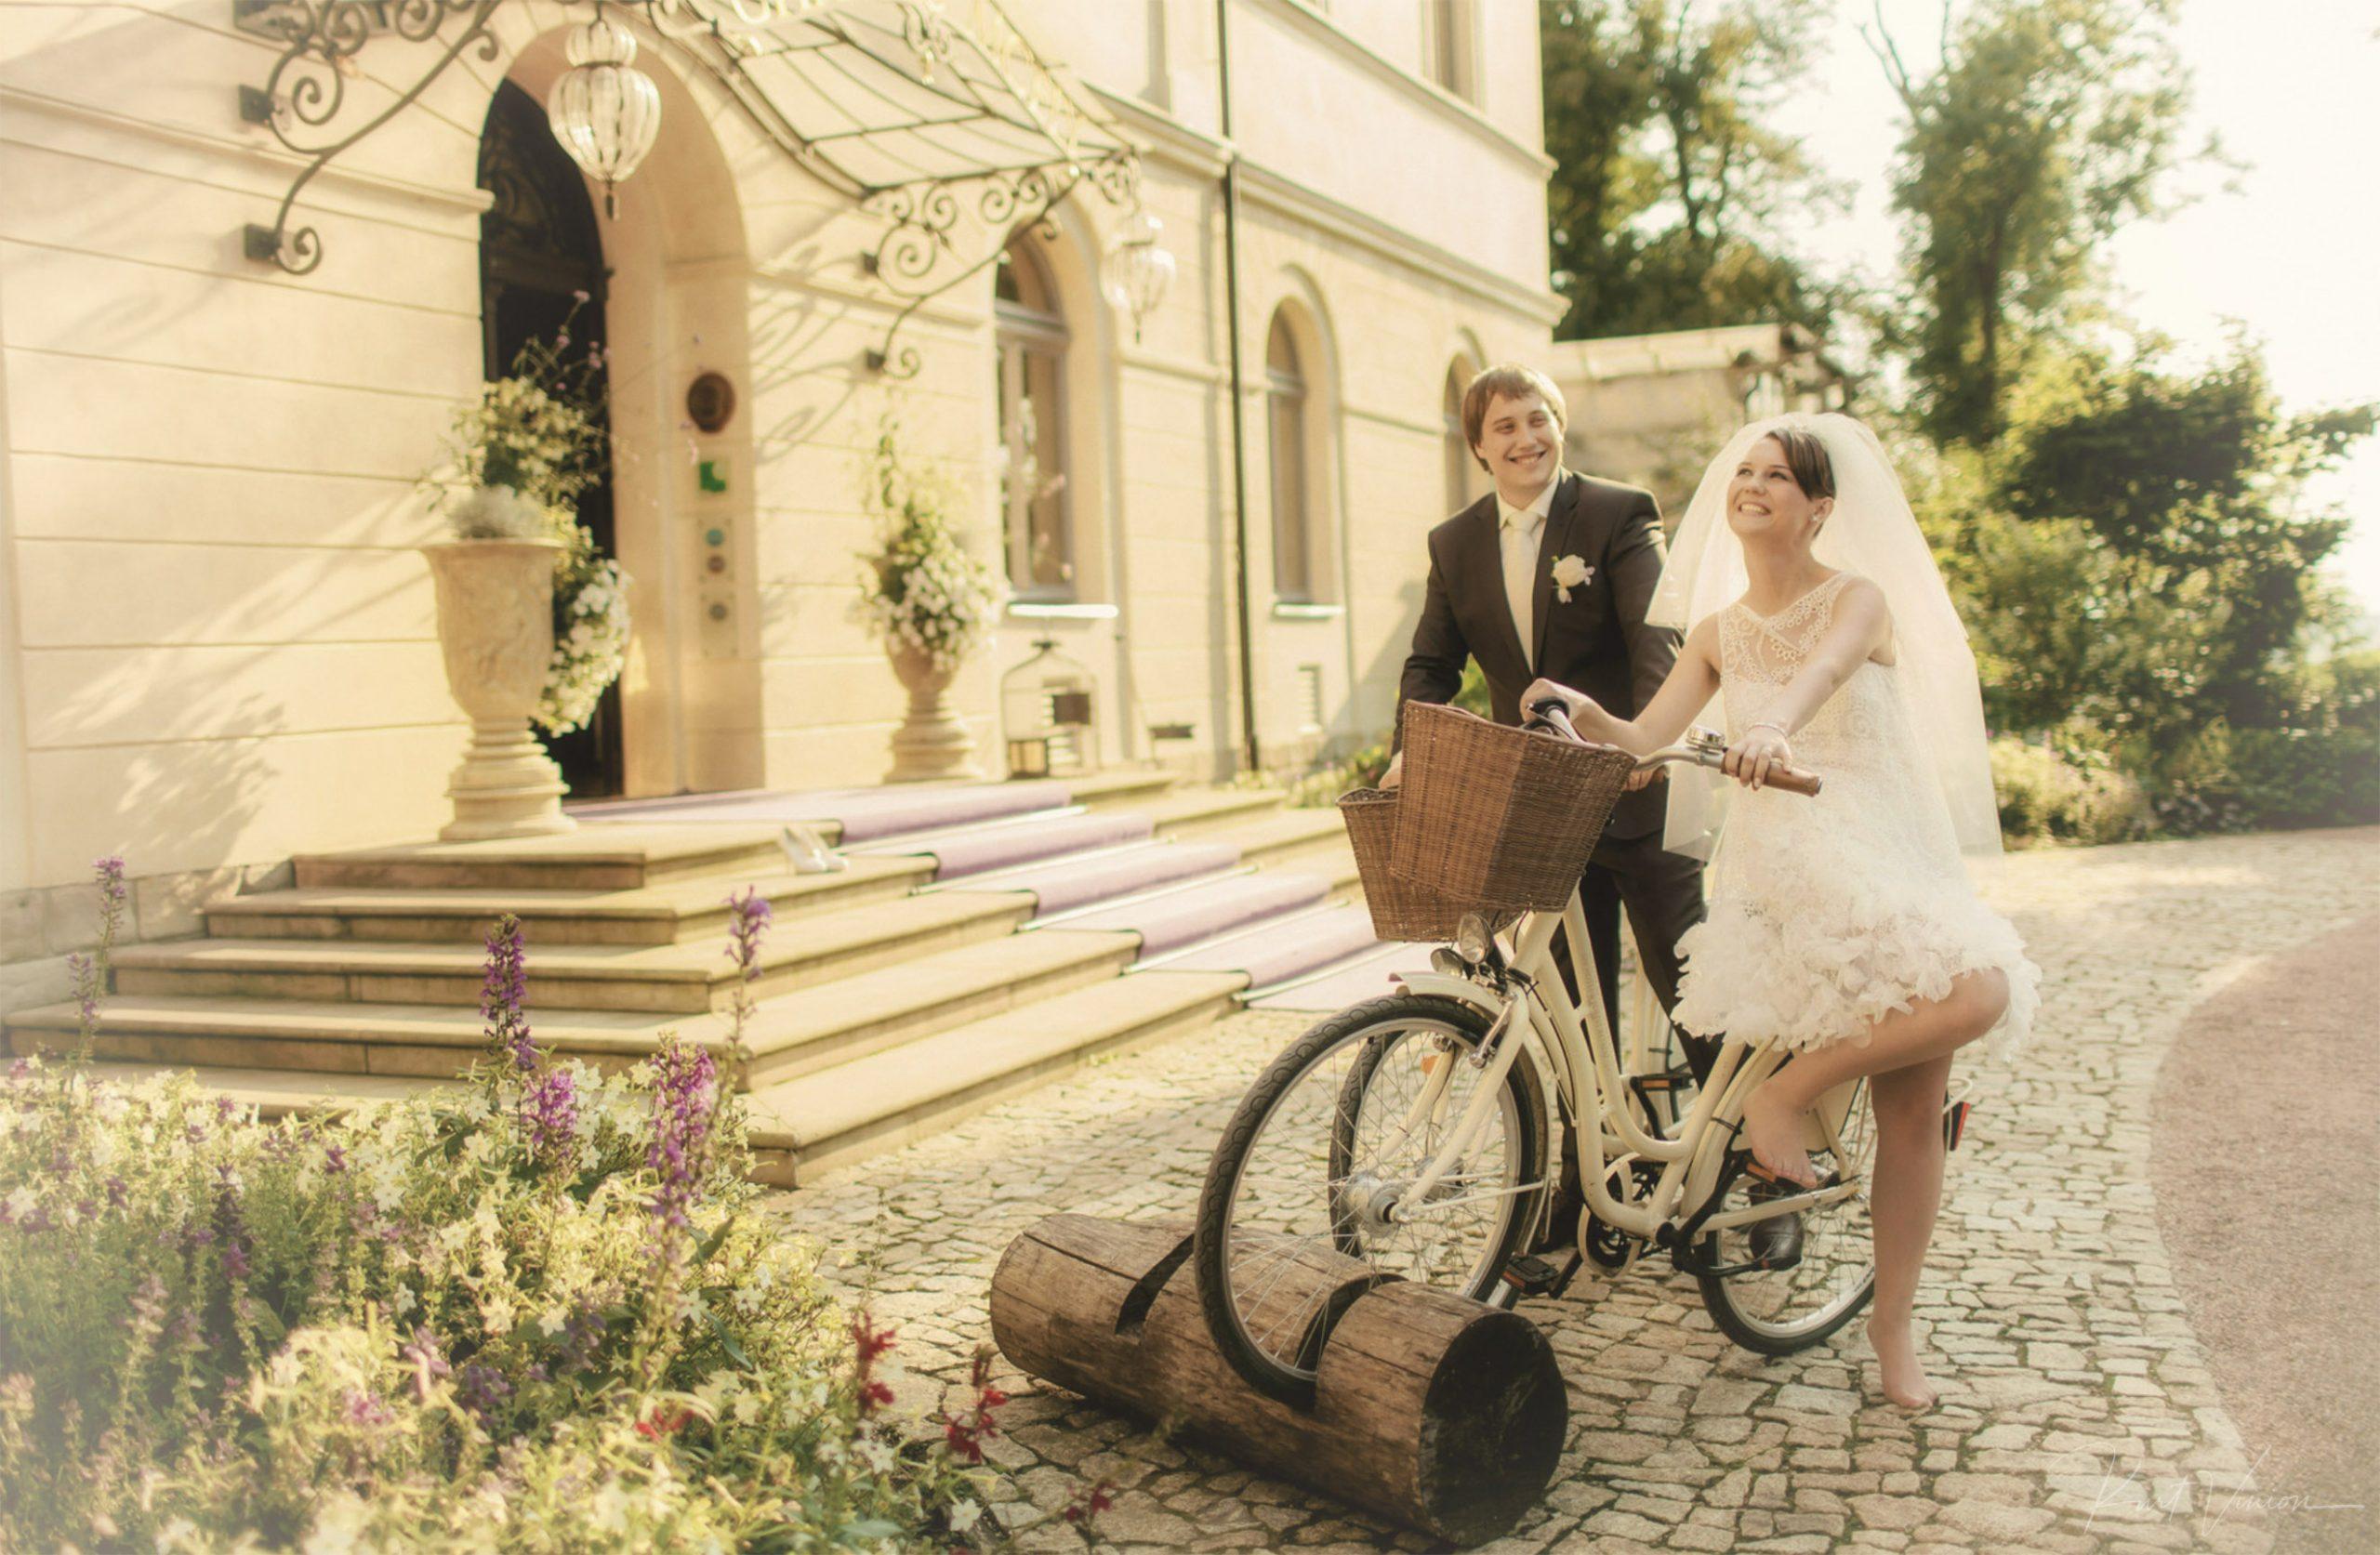 Kurt-Vinion-Wedding-Photographer-Prague-6